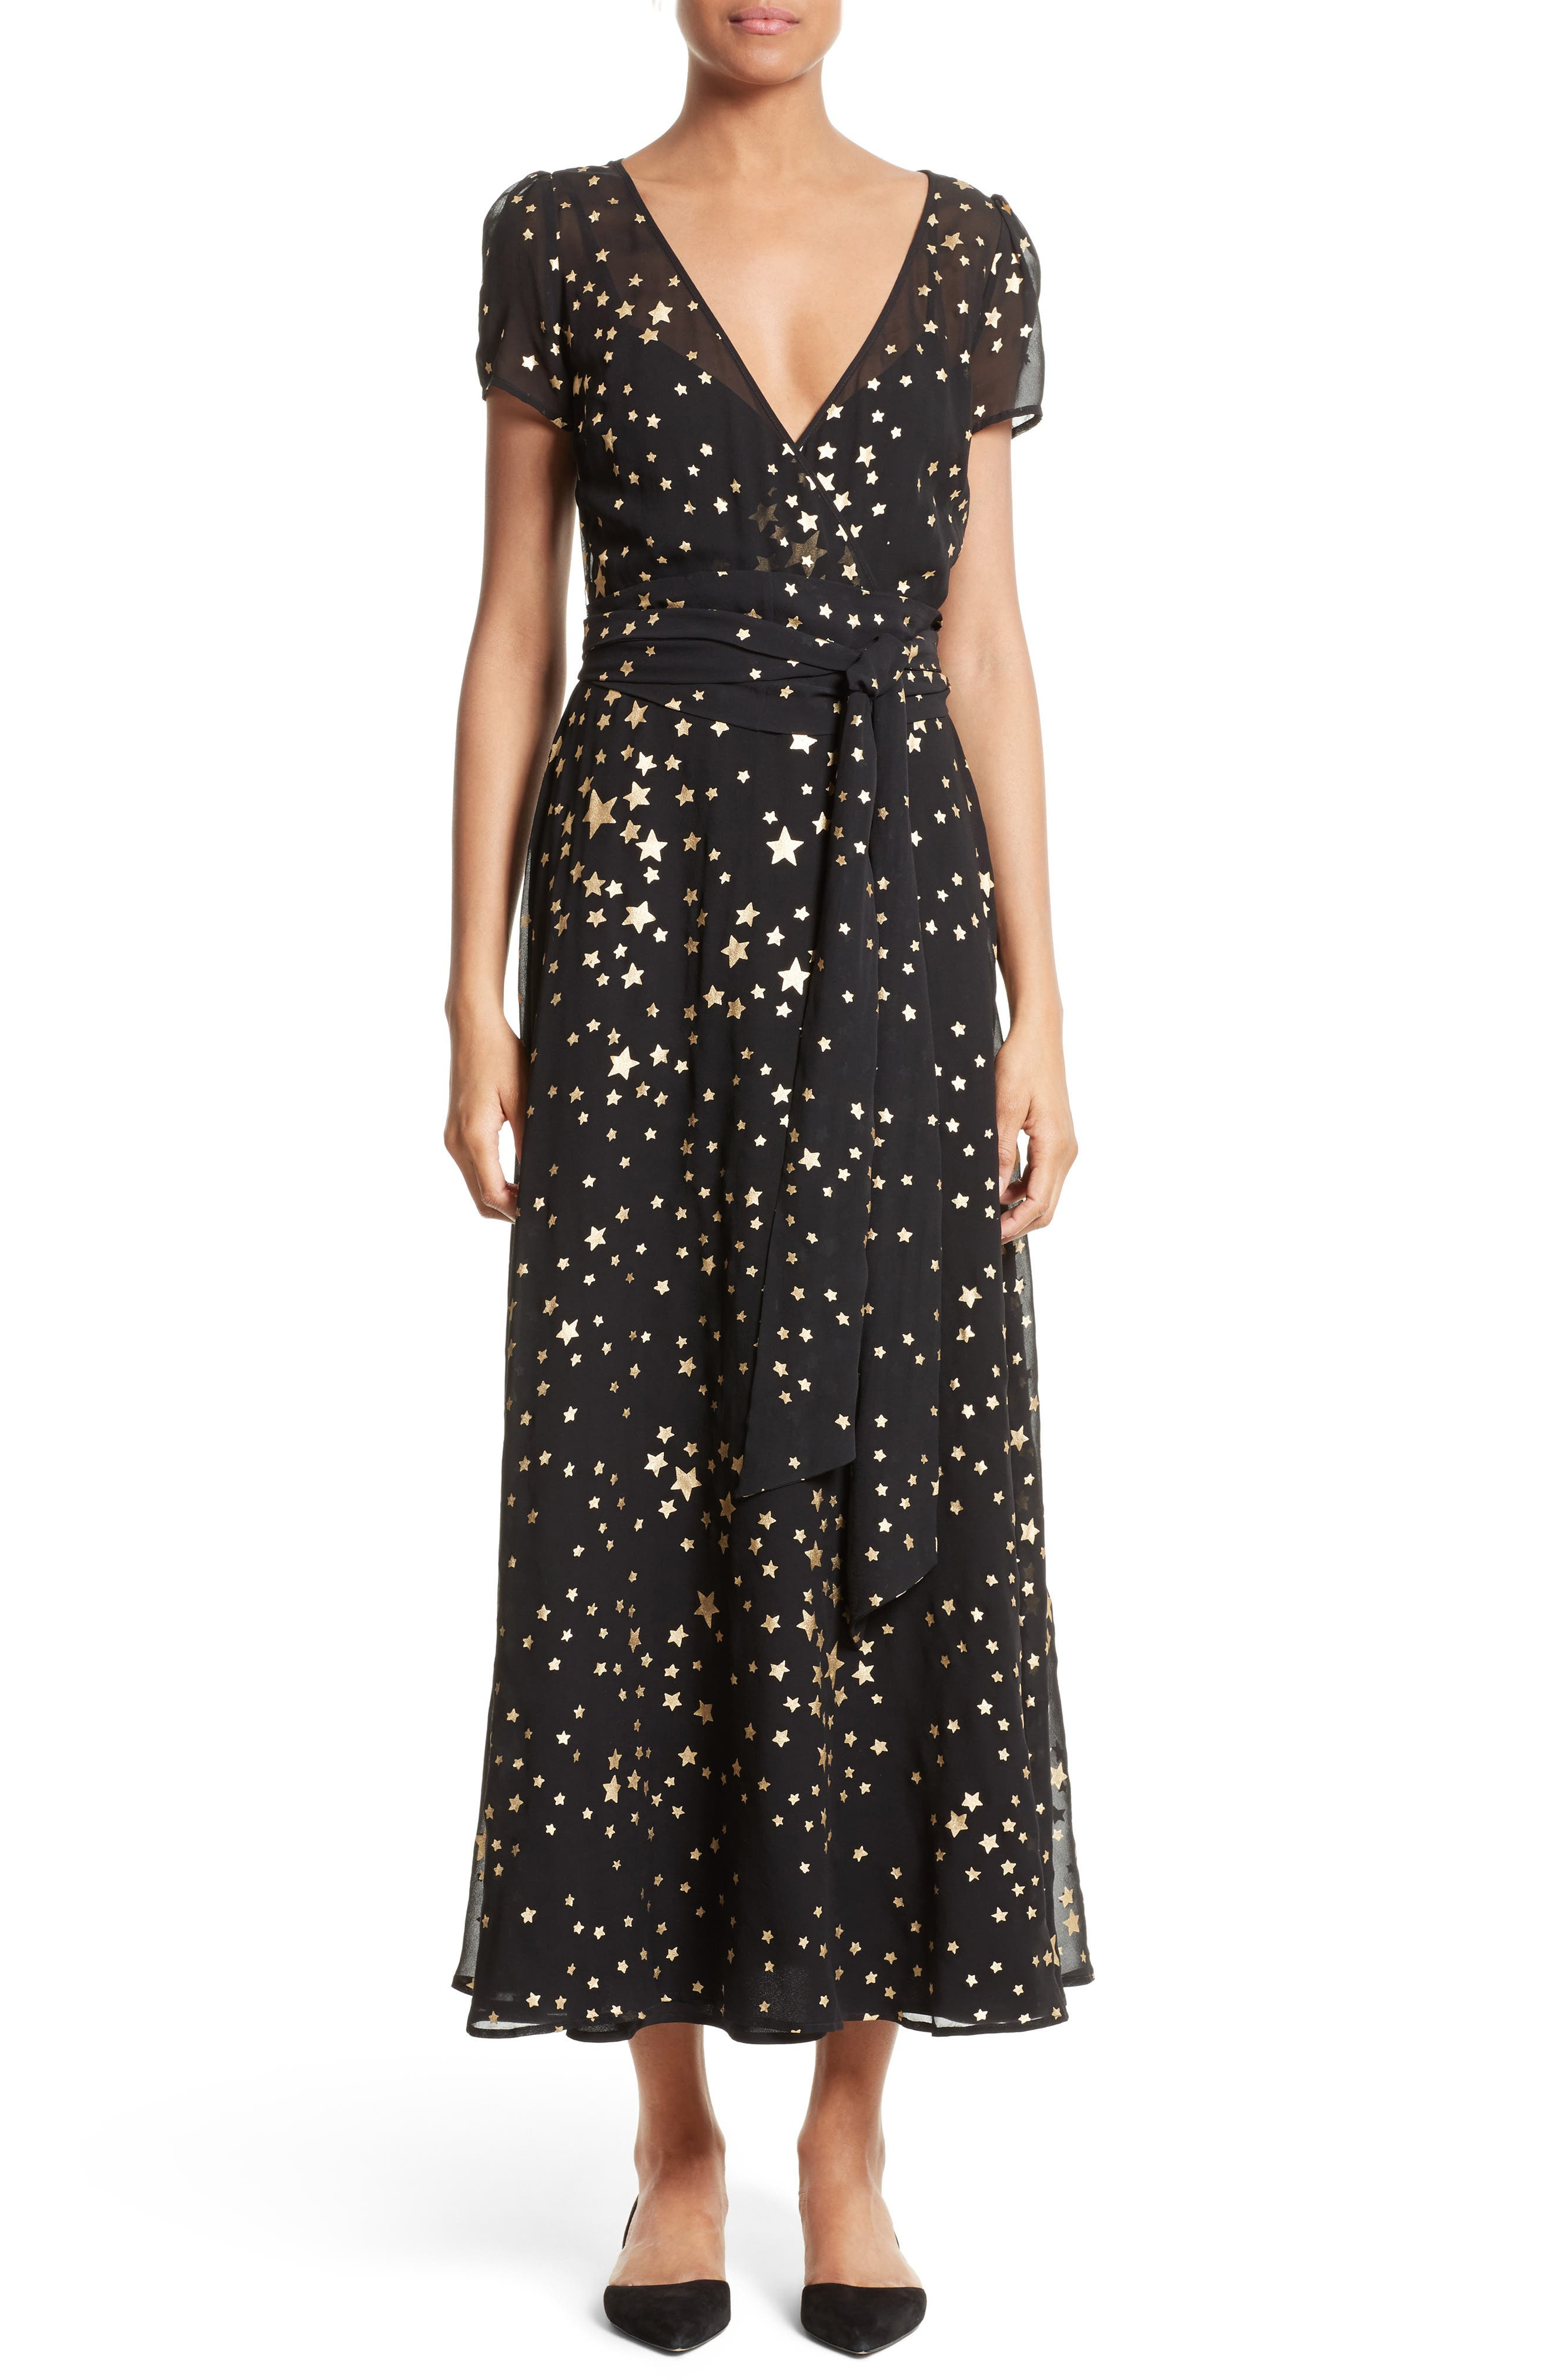 RED VALENTINO, Lamé Star Wrap Maxi Dress, Main thumbnail 1, color, 001